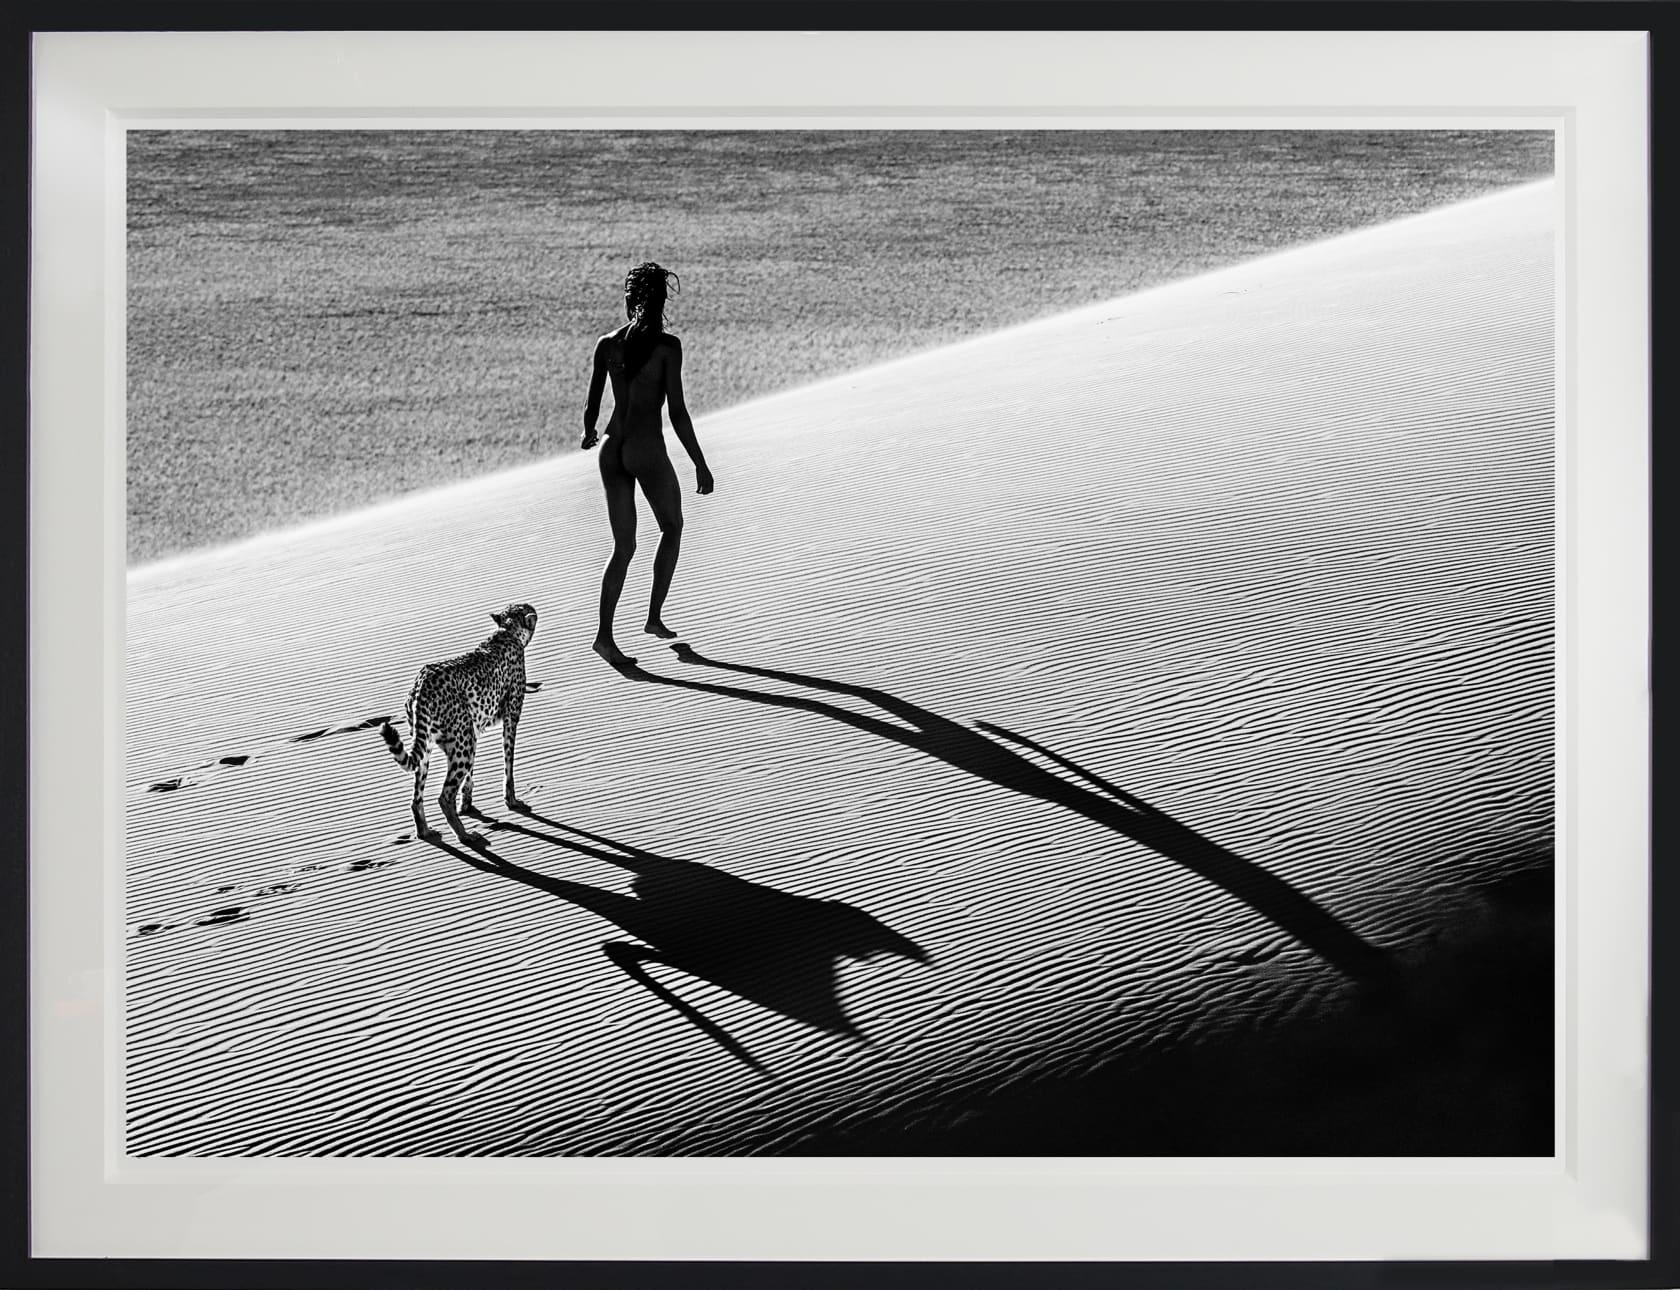 David Yarrow, On The Catwalk, 2013